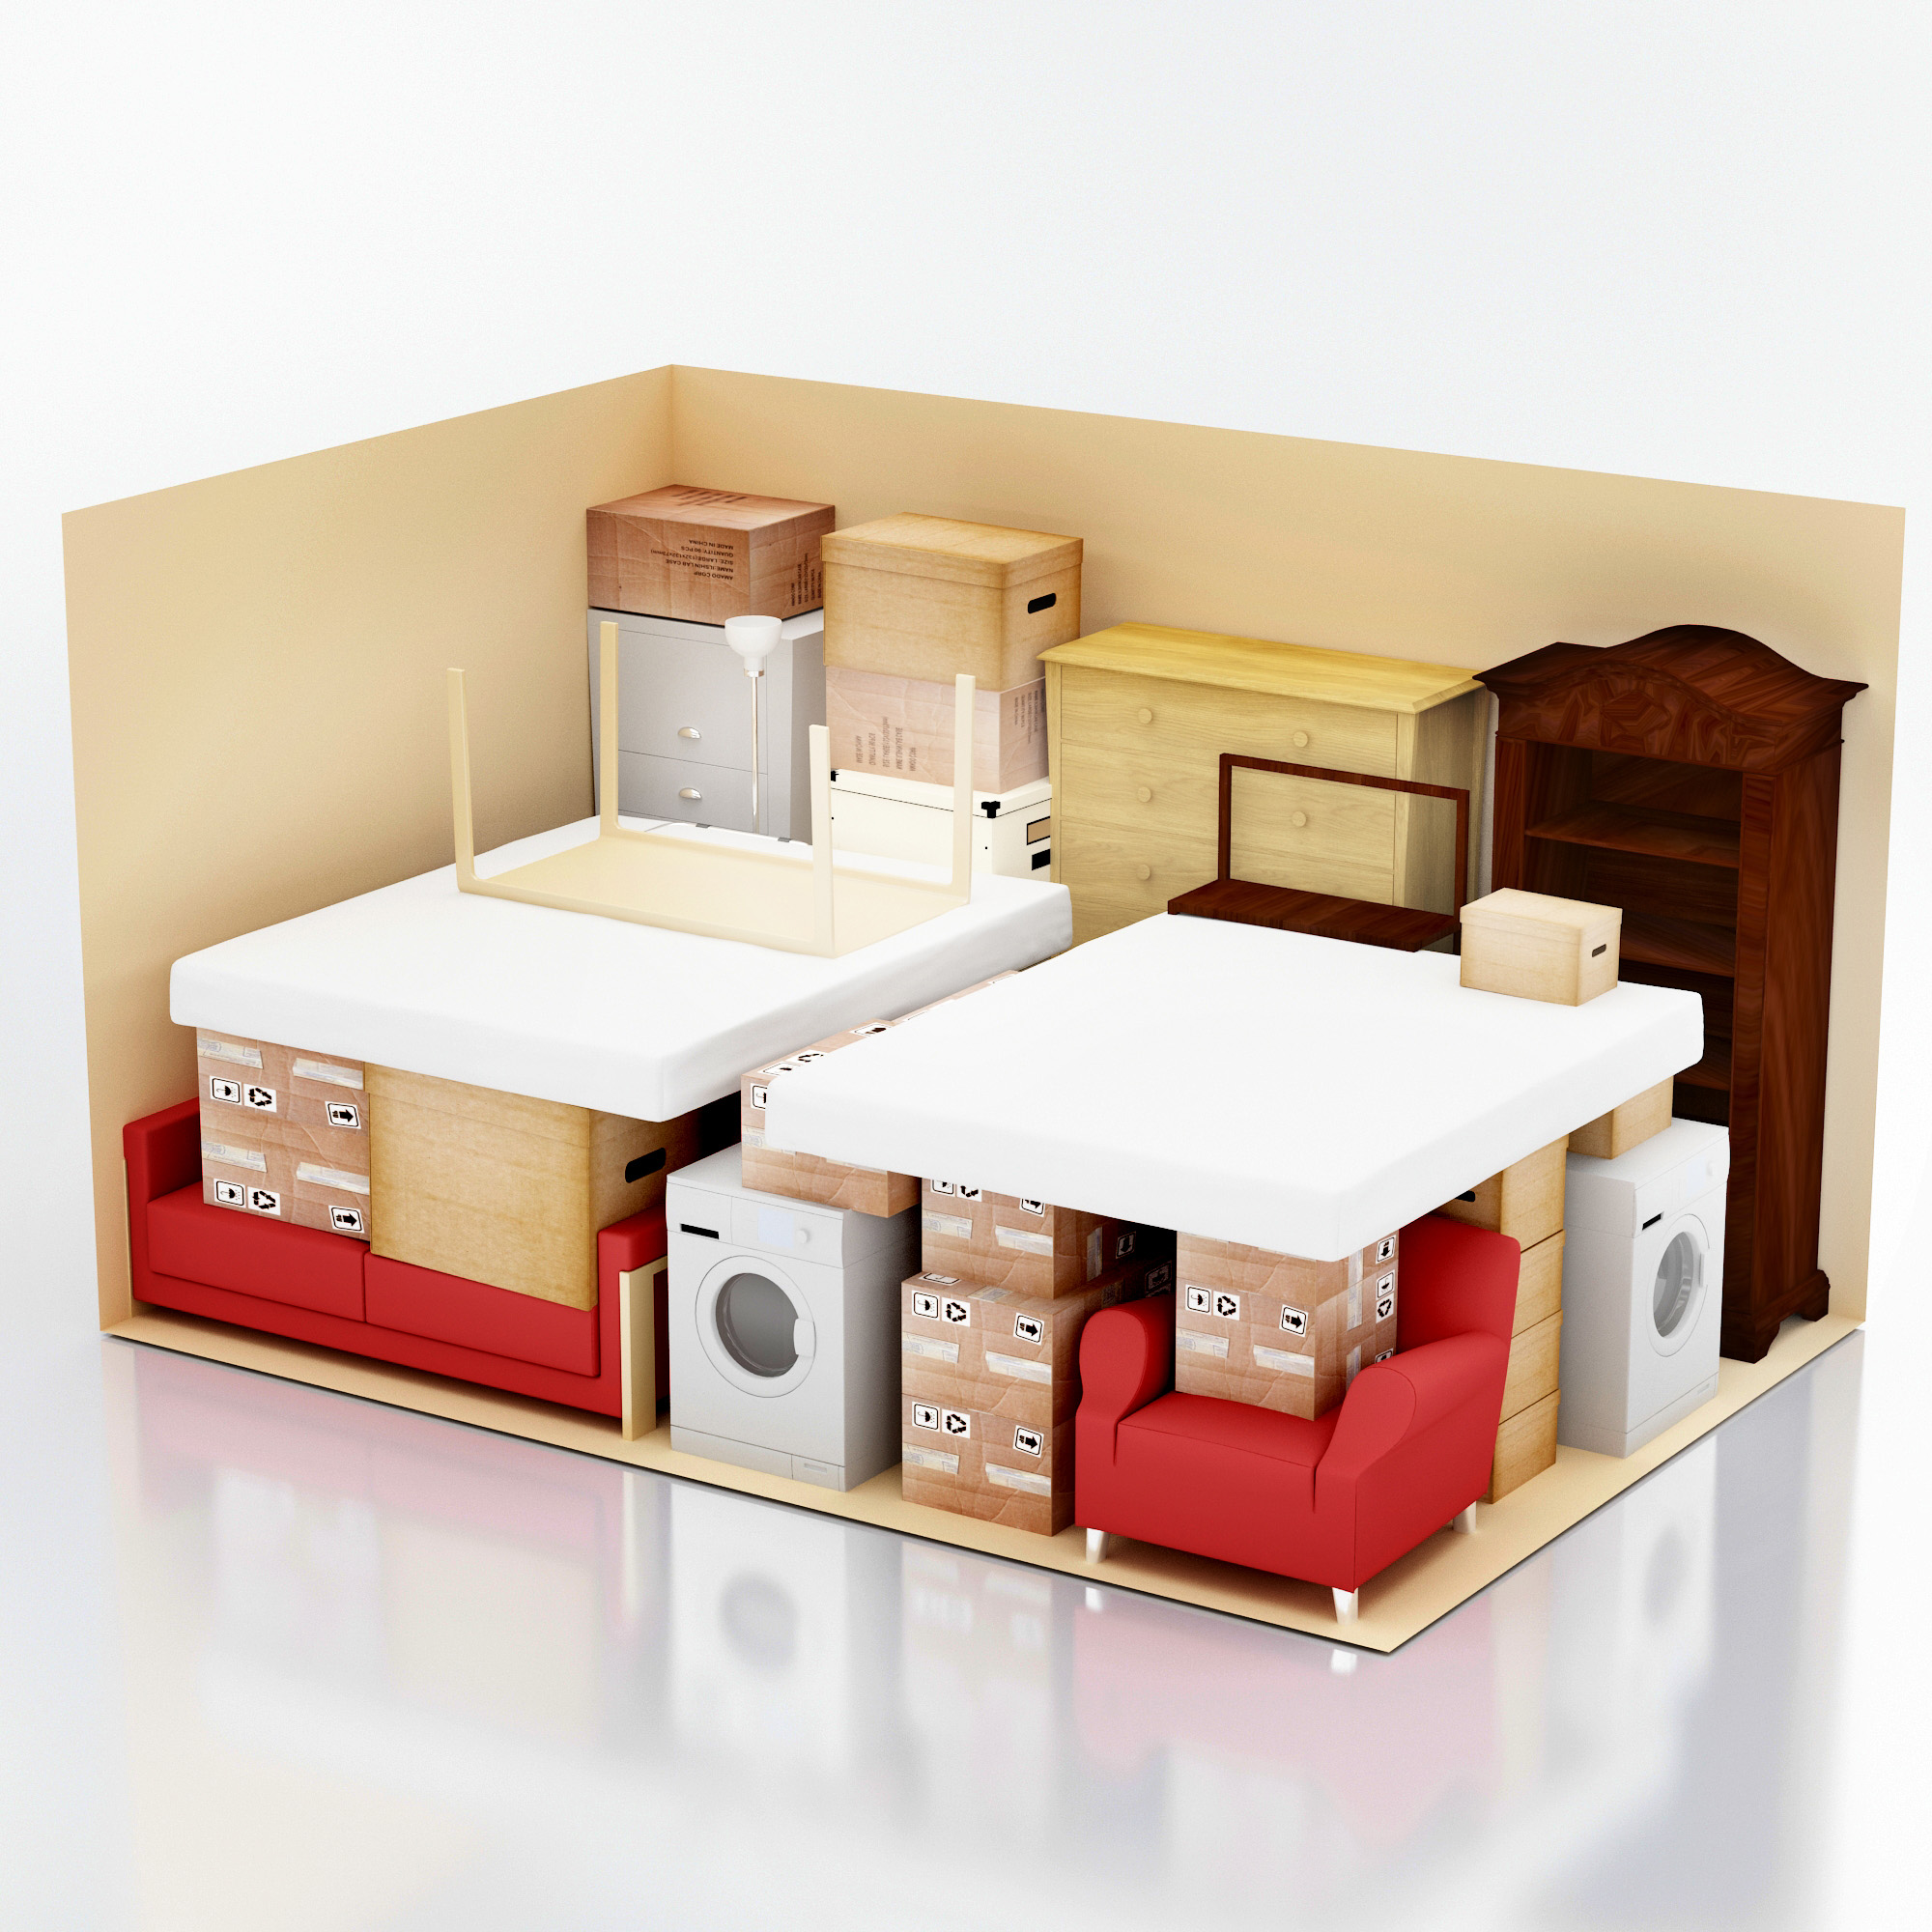 Storage model